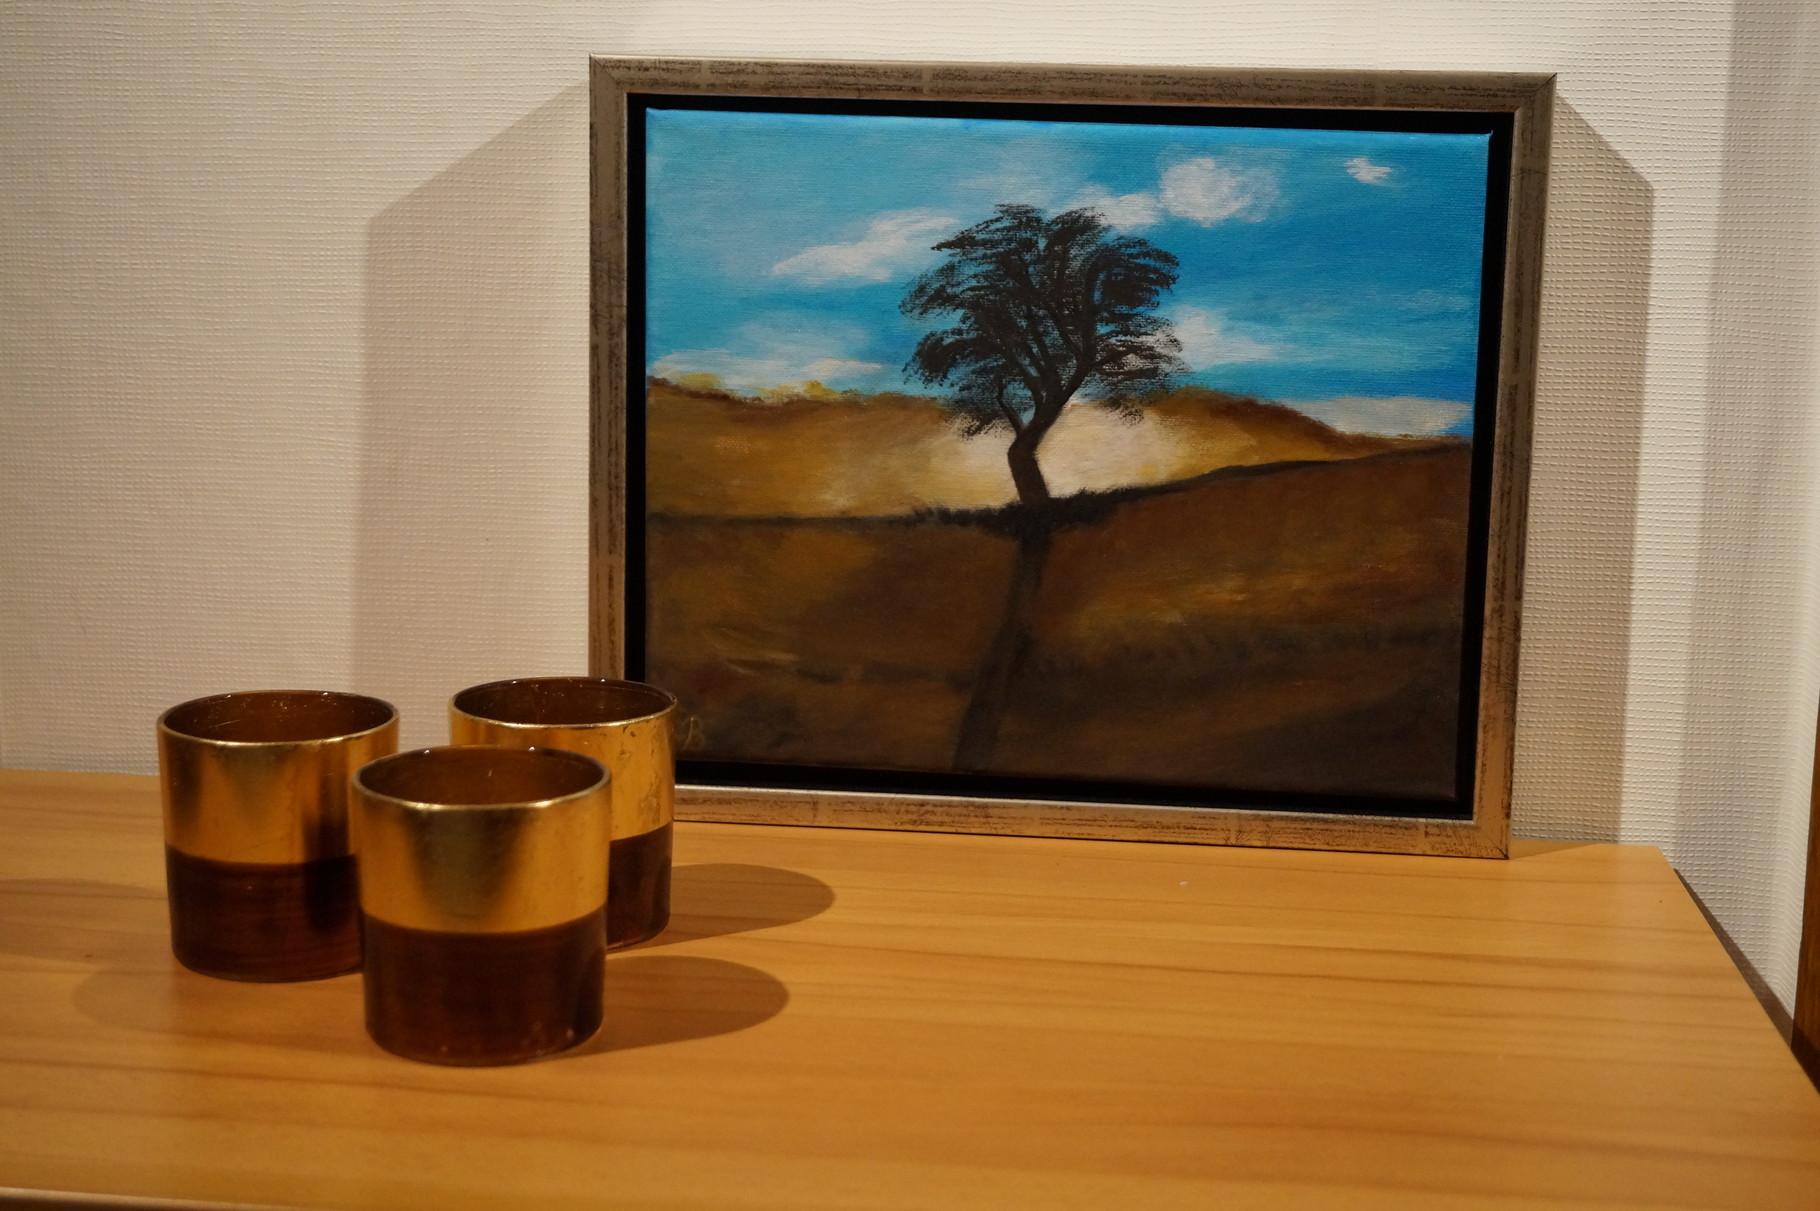 Afrika im Morgenlicht - 34 x 28 cm incl. Rahmen - Acryl